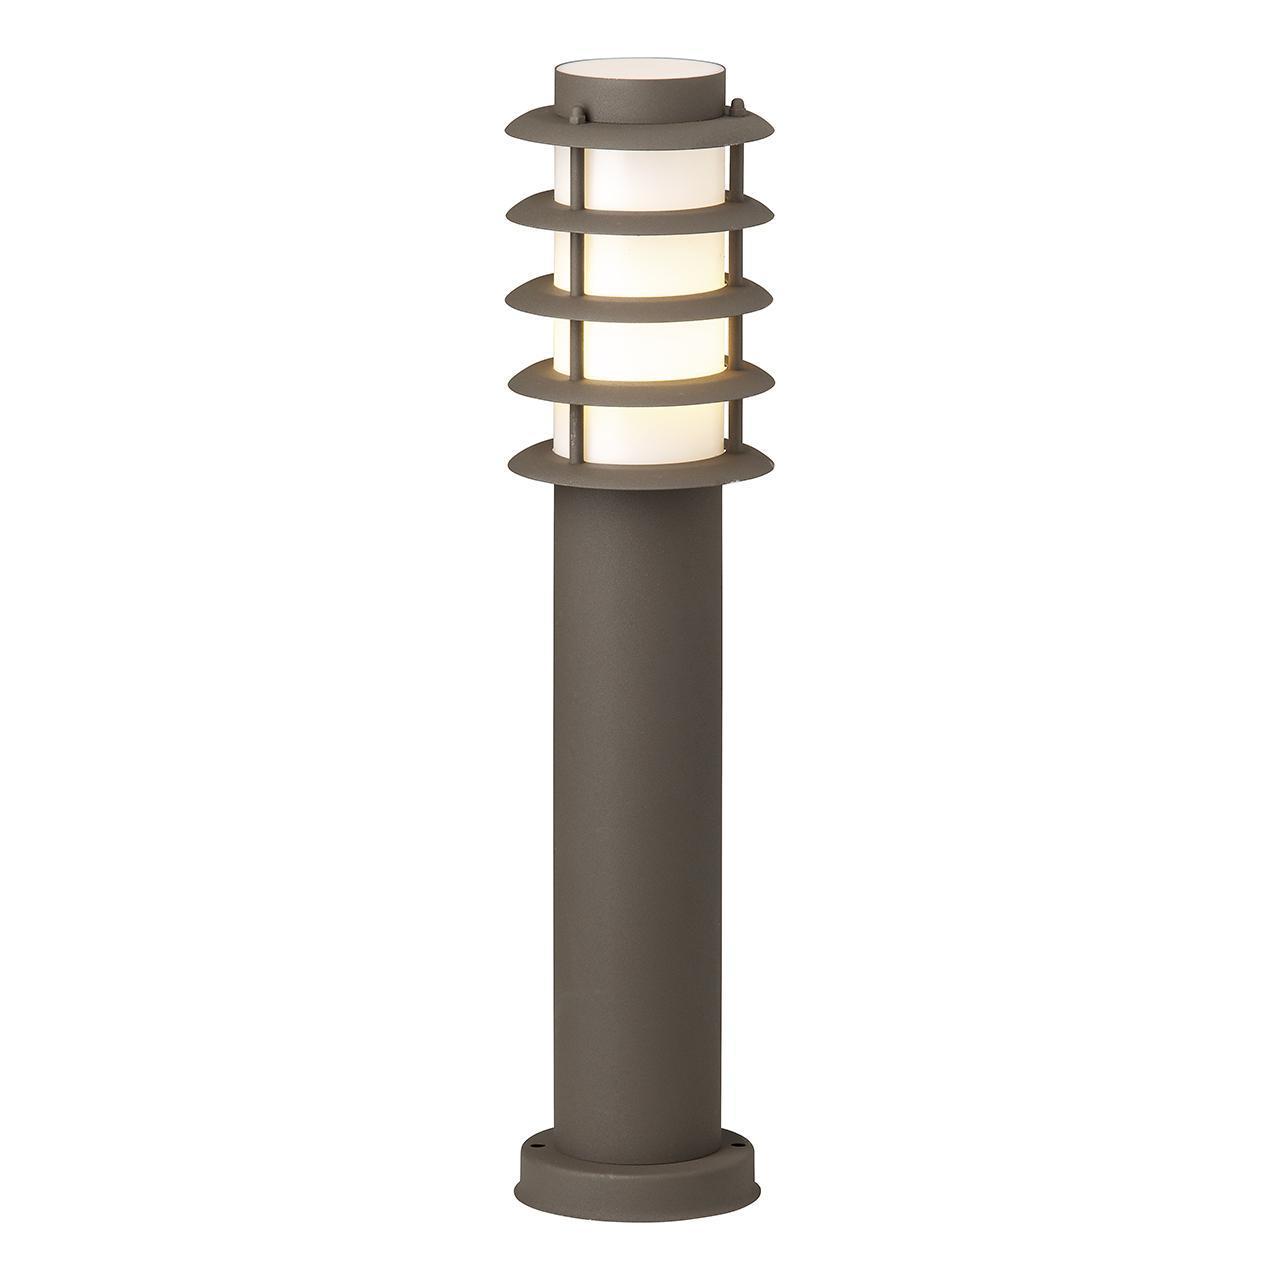 Уличный светильник Brilliant Malo 46884/55